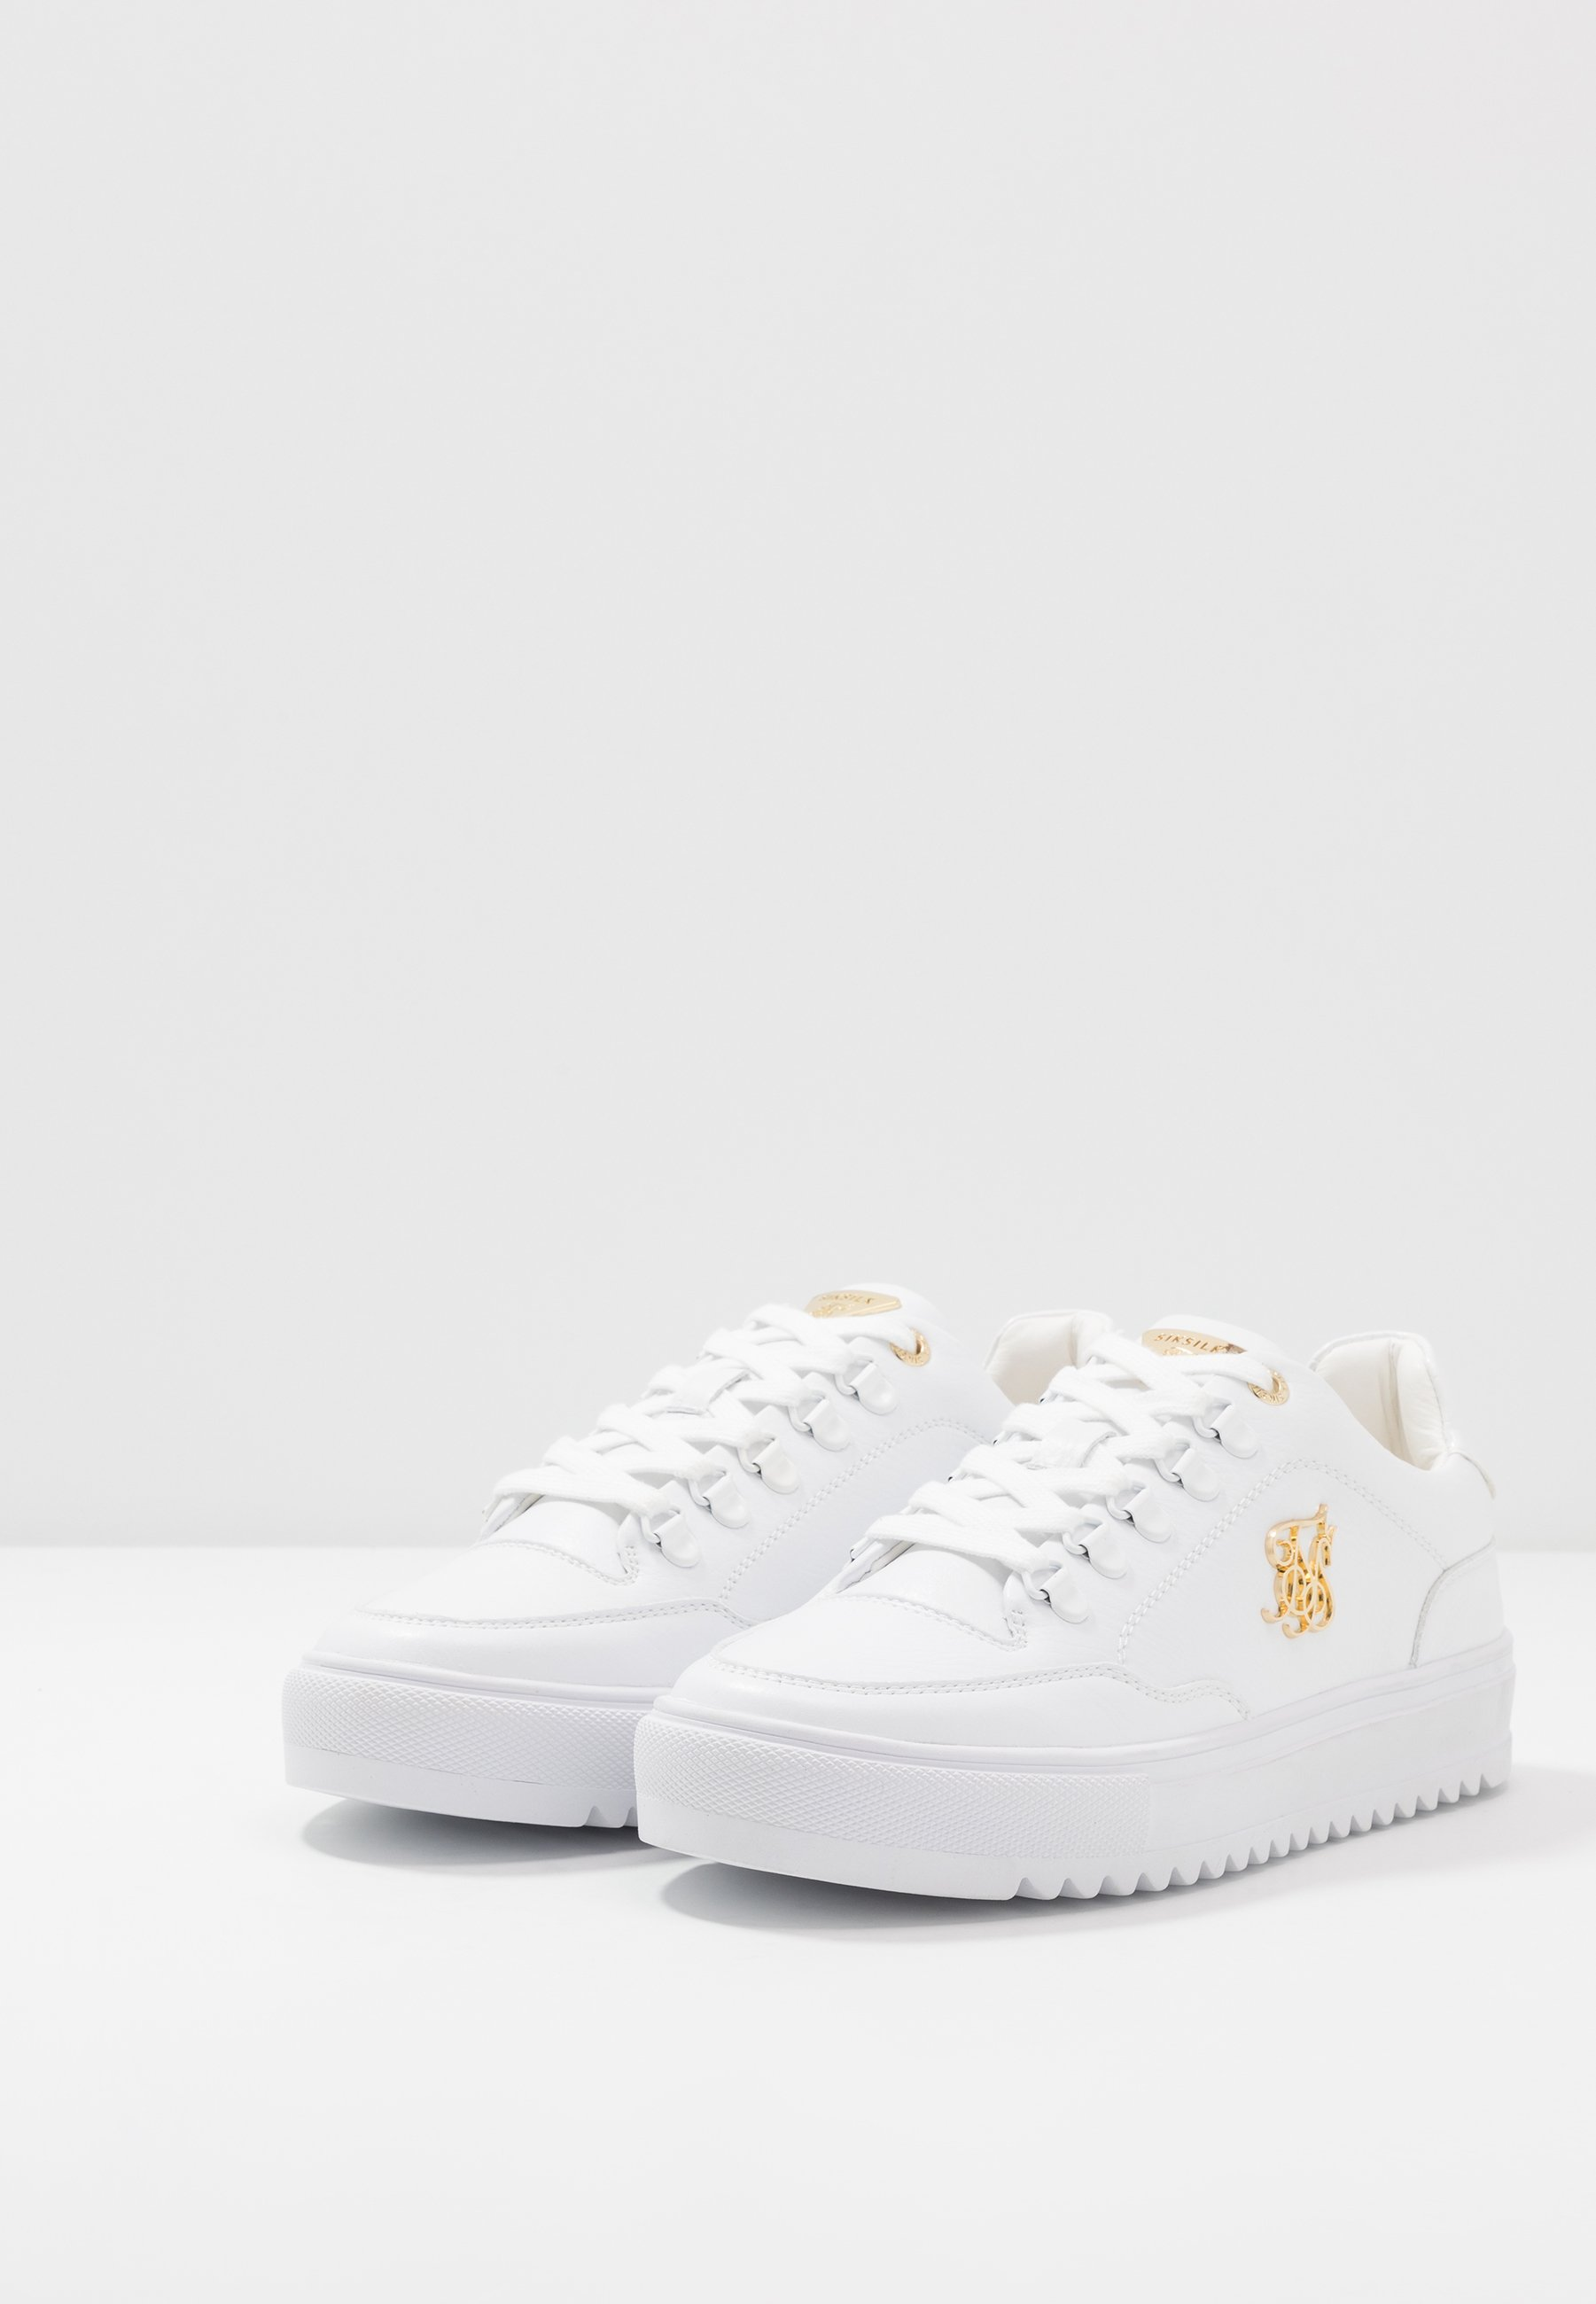 Caldo Scarpe da uomo SIKSILK GRAVITY Sneakers basse white